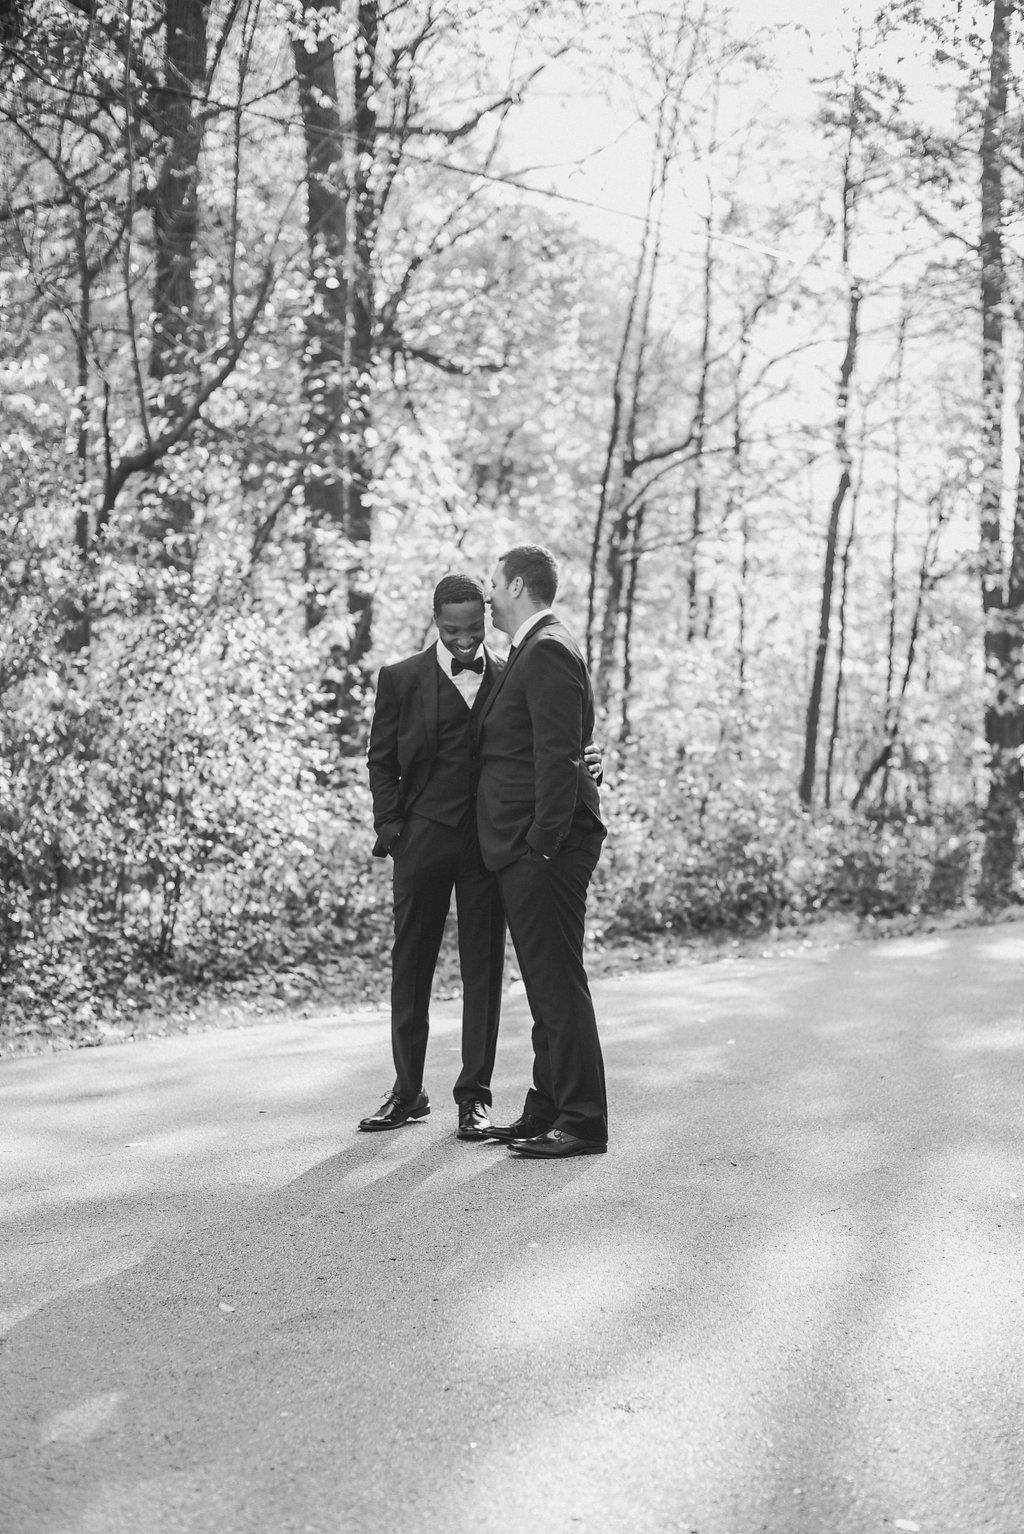 RiverClubofMequon-MequonWI-LGBT-Gay-StyledShoot-9.jpg